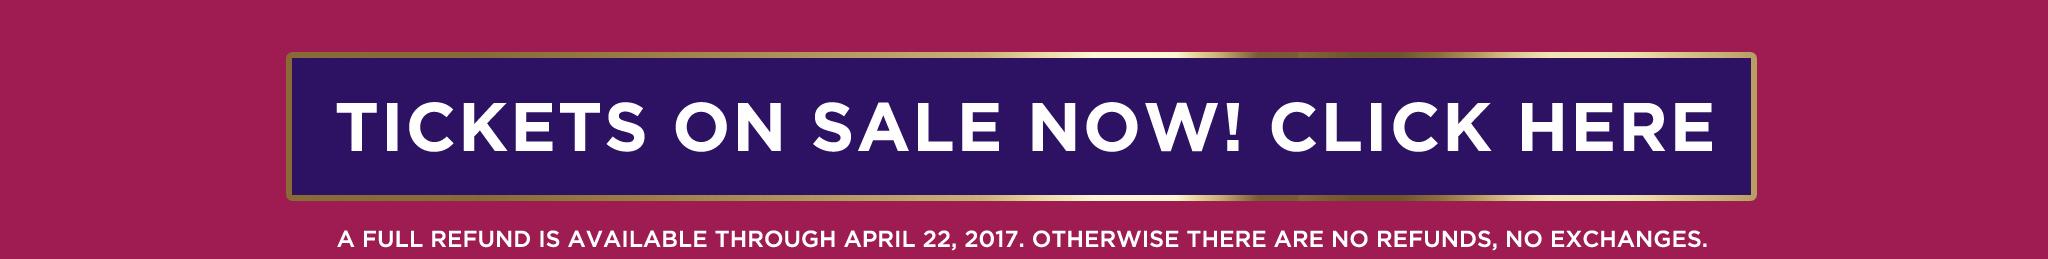 Tickets on Sale January 15, 2017